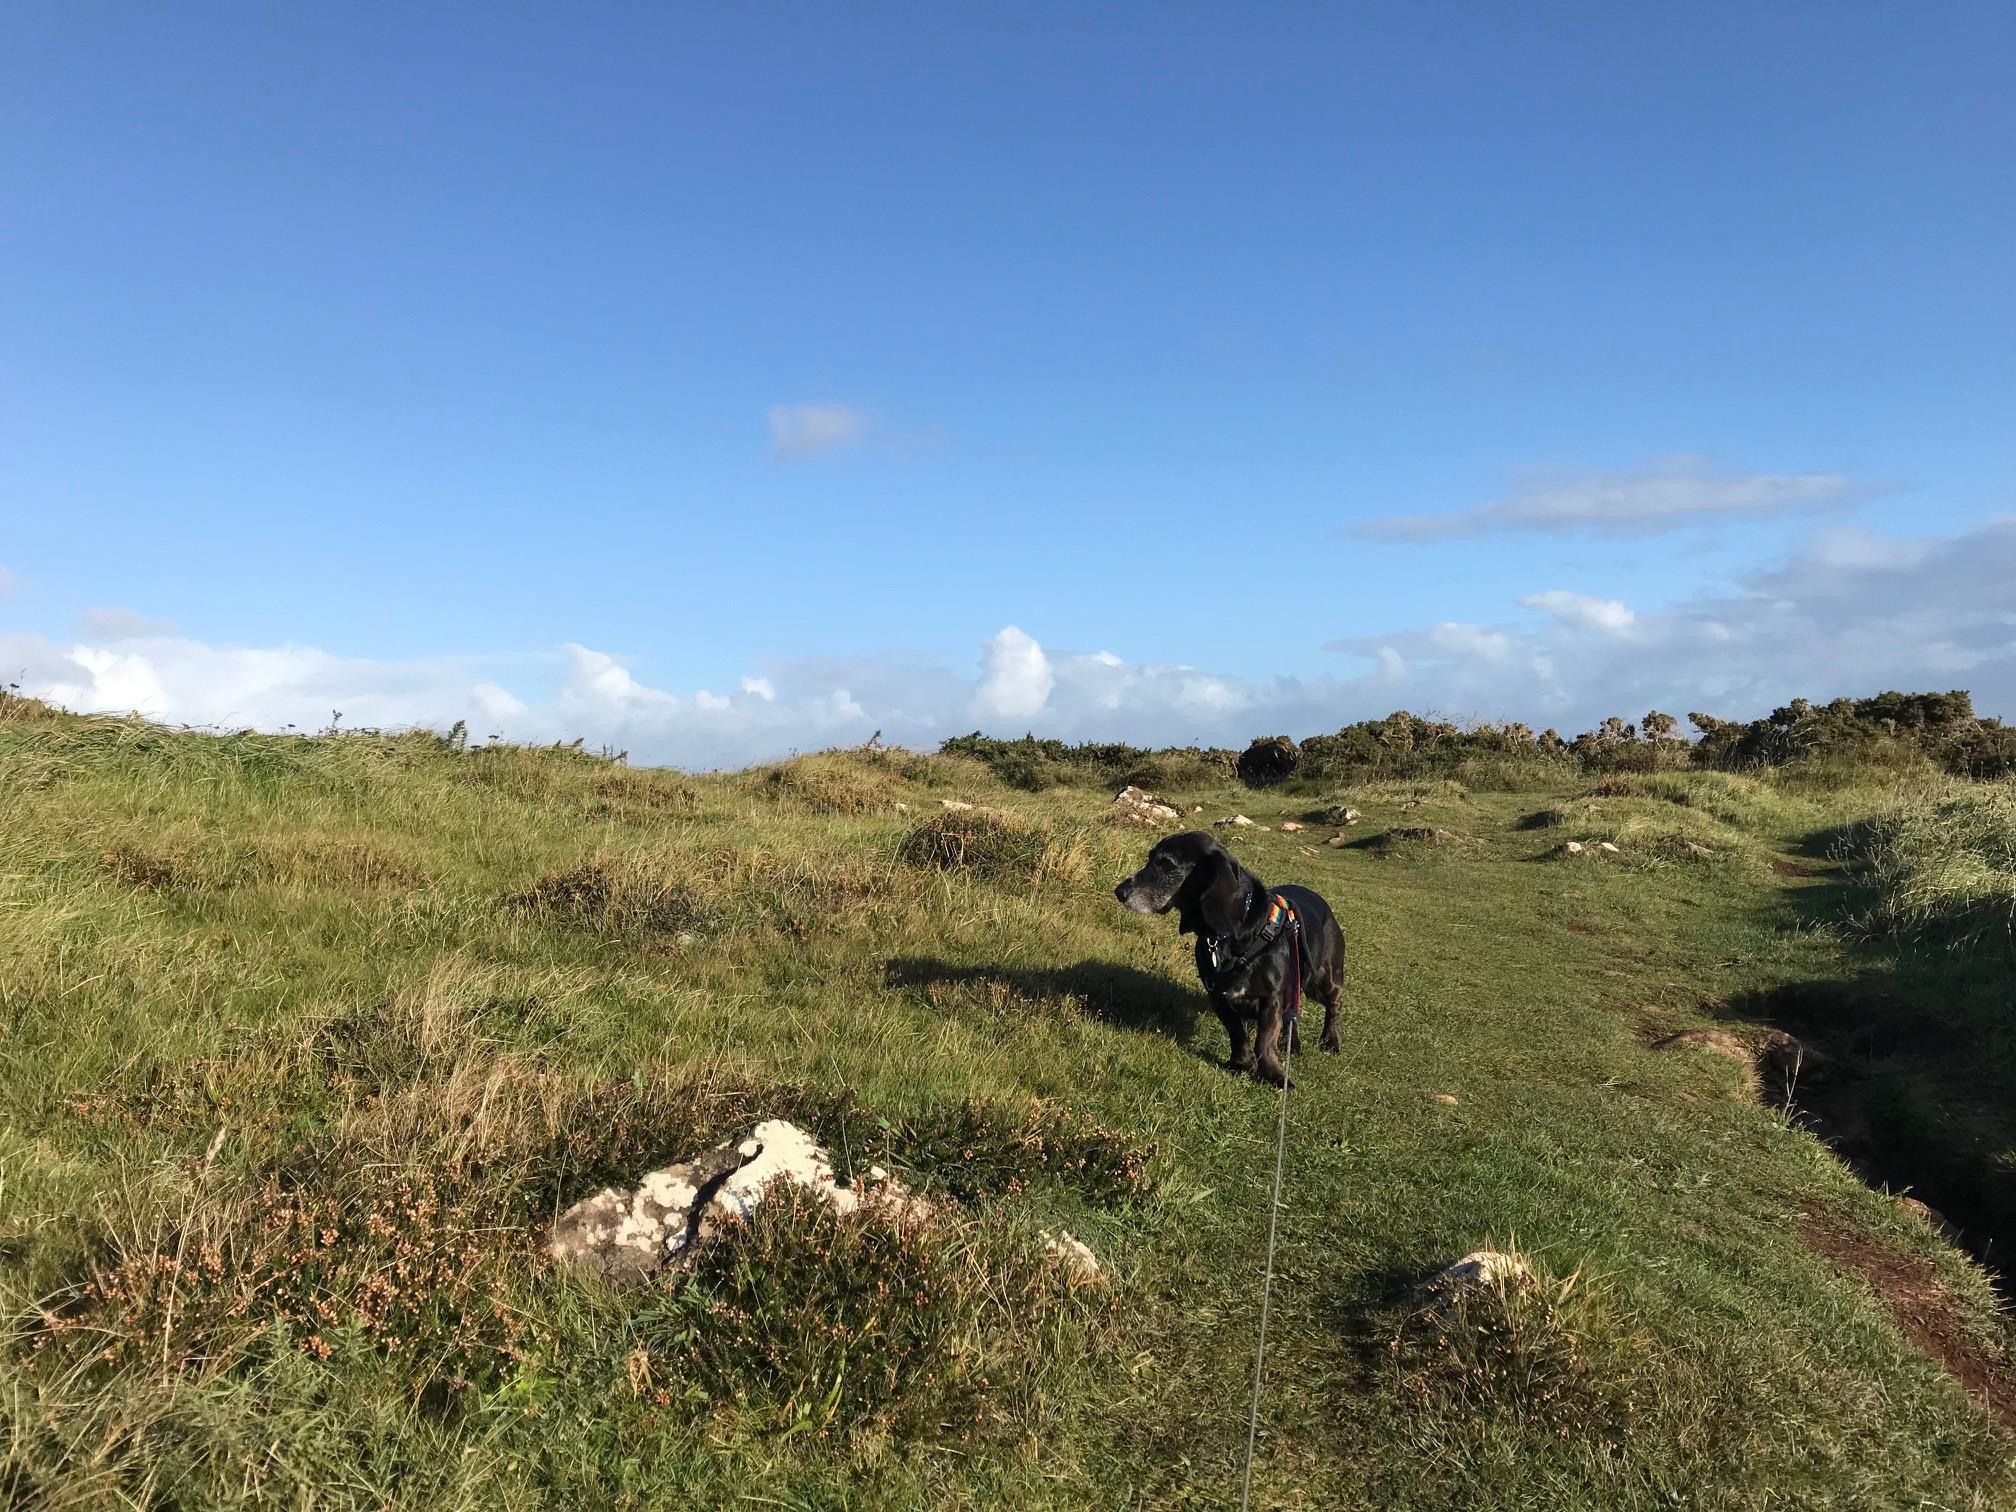 Poppydog on the Cornish coast path